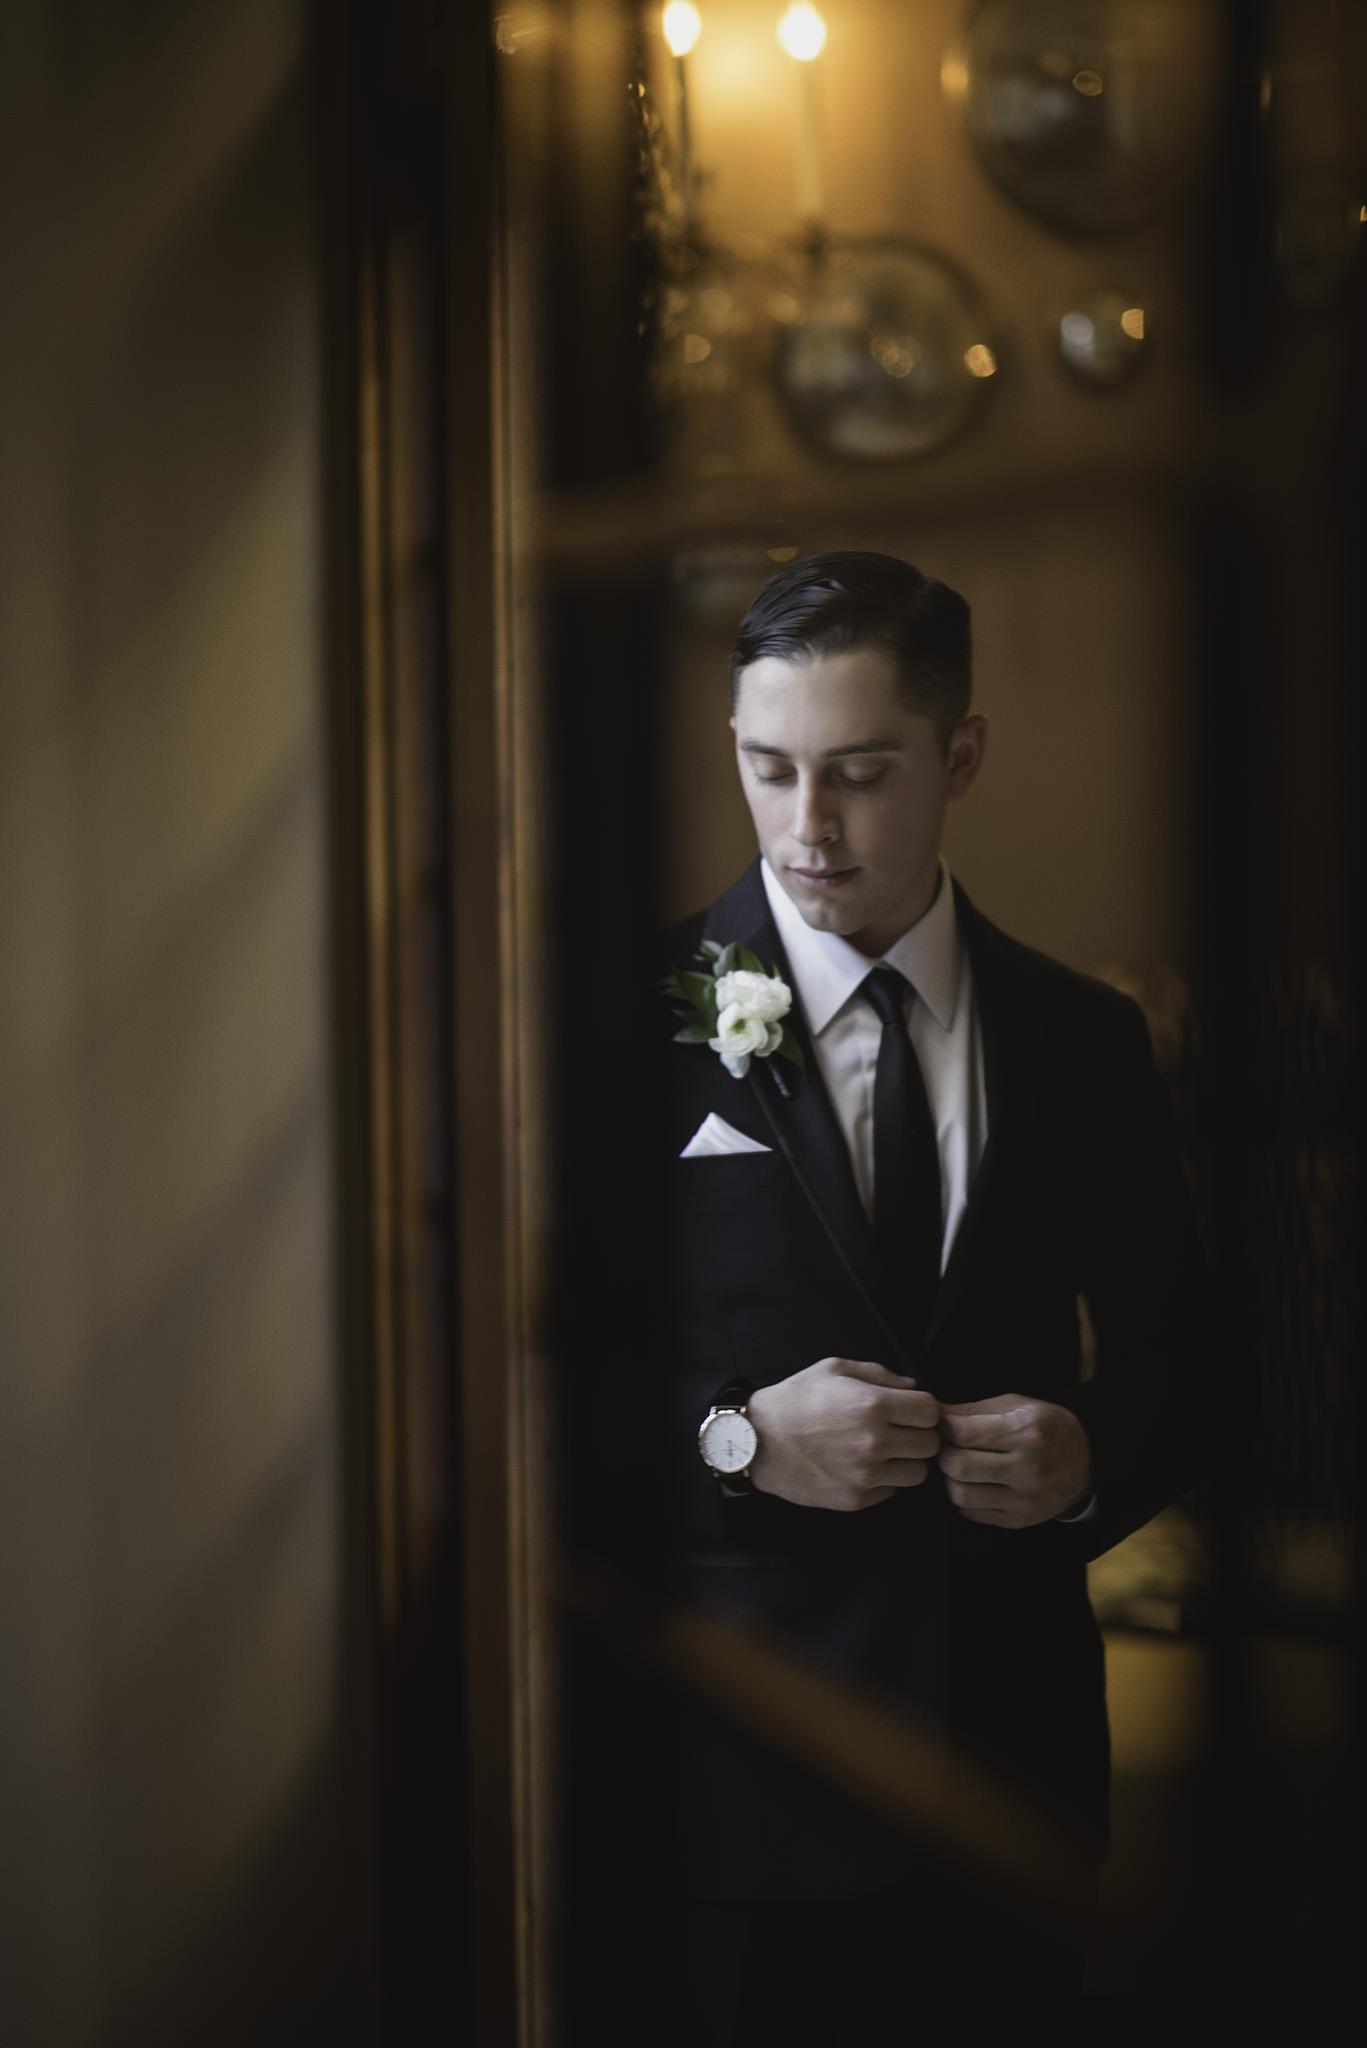 Claire-Travis-Classy-artistic-Downtown-Houston-Rice-ballroom-wedding-sm-005.jpg